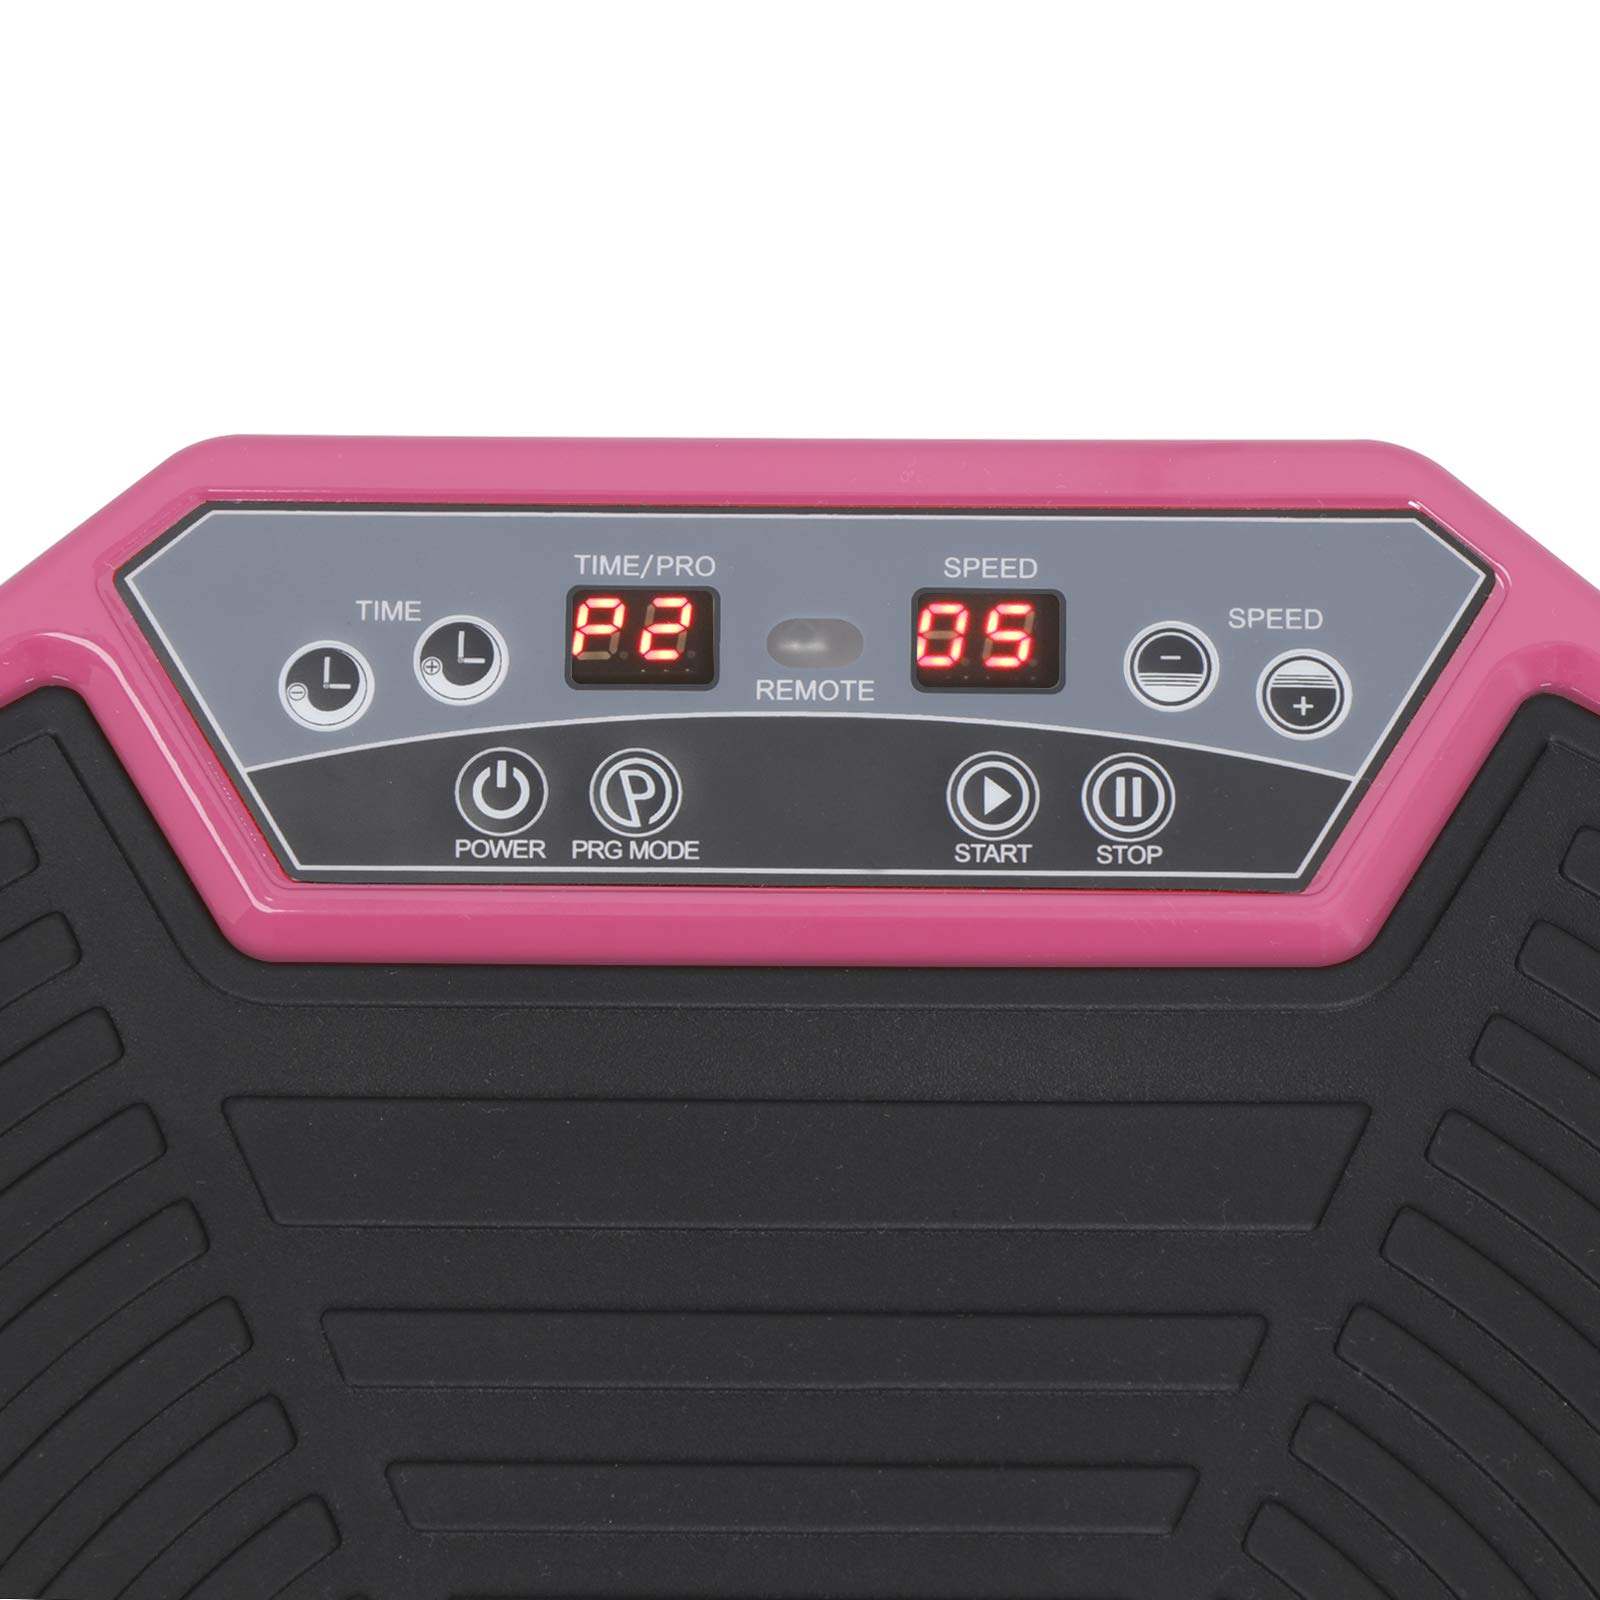 ZENY Vibration Plateform Machines Whole Body Vibrating Plate Machine Workout Fitness Shaking Machine w/Bluetooth Home Training Exercise Equipment (Pink) by ZENY (Image #6)